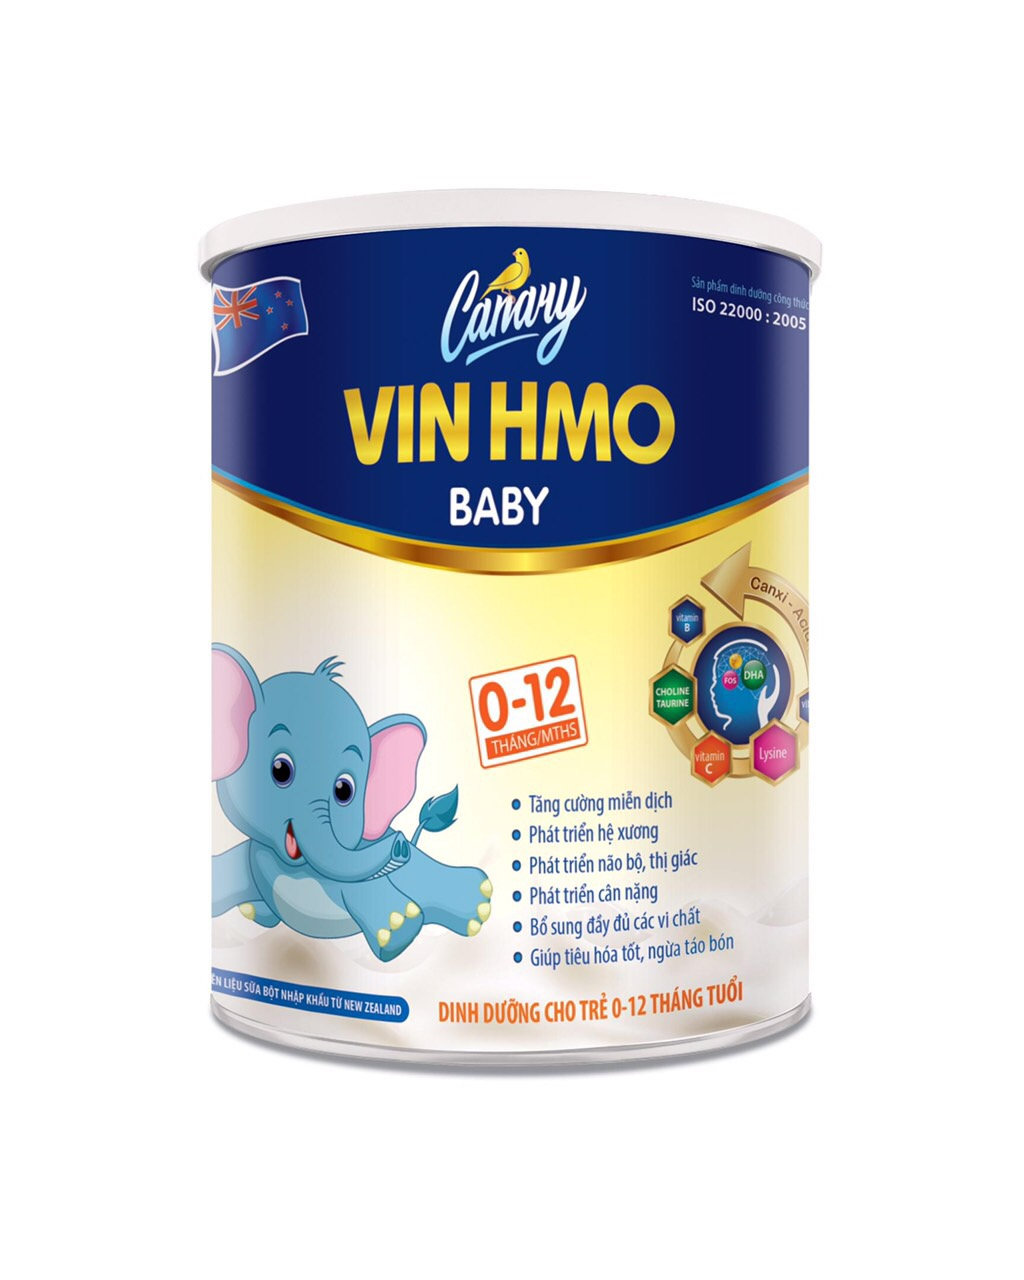 vin-hmo-baby-900g